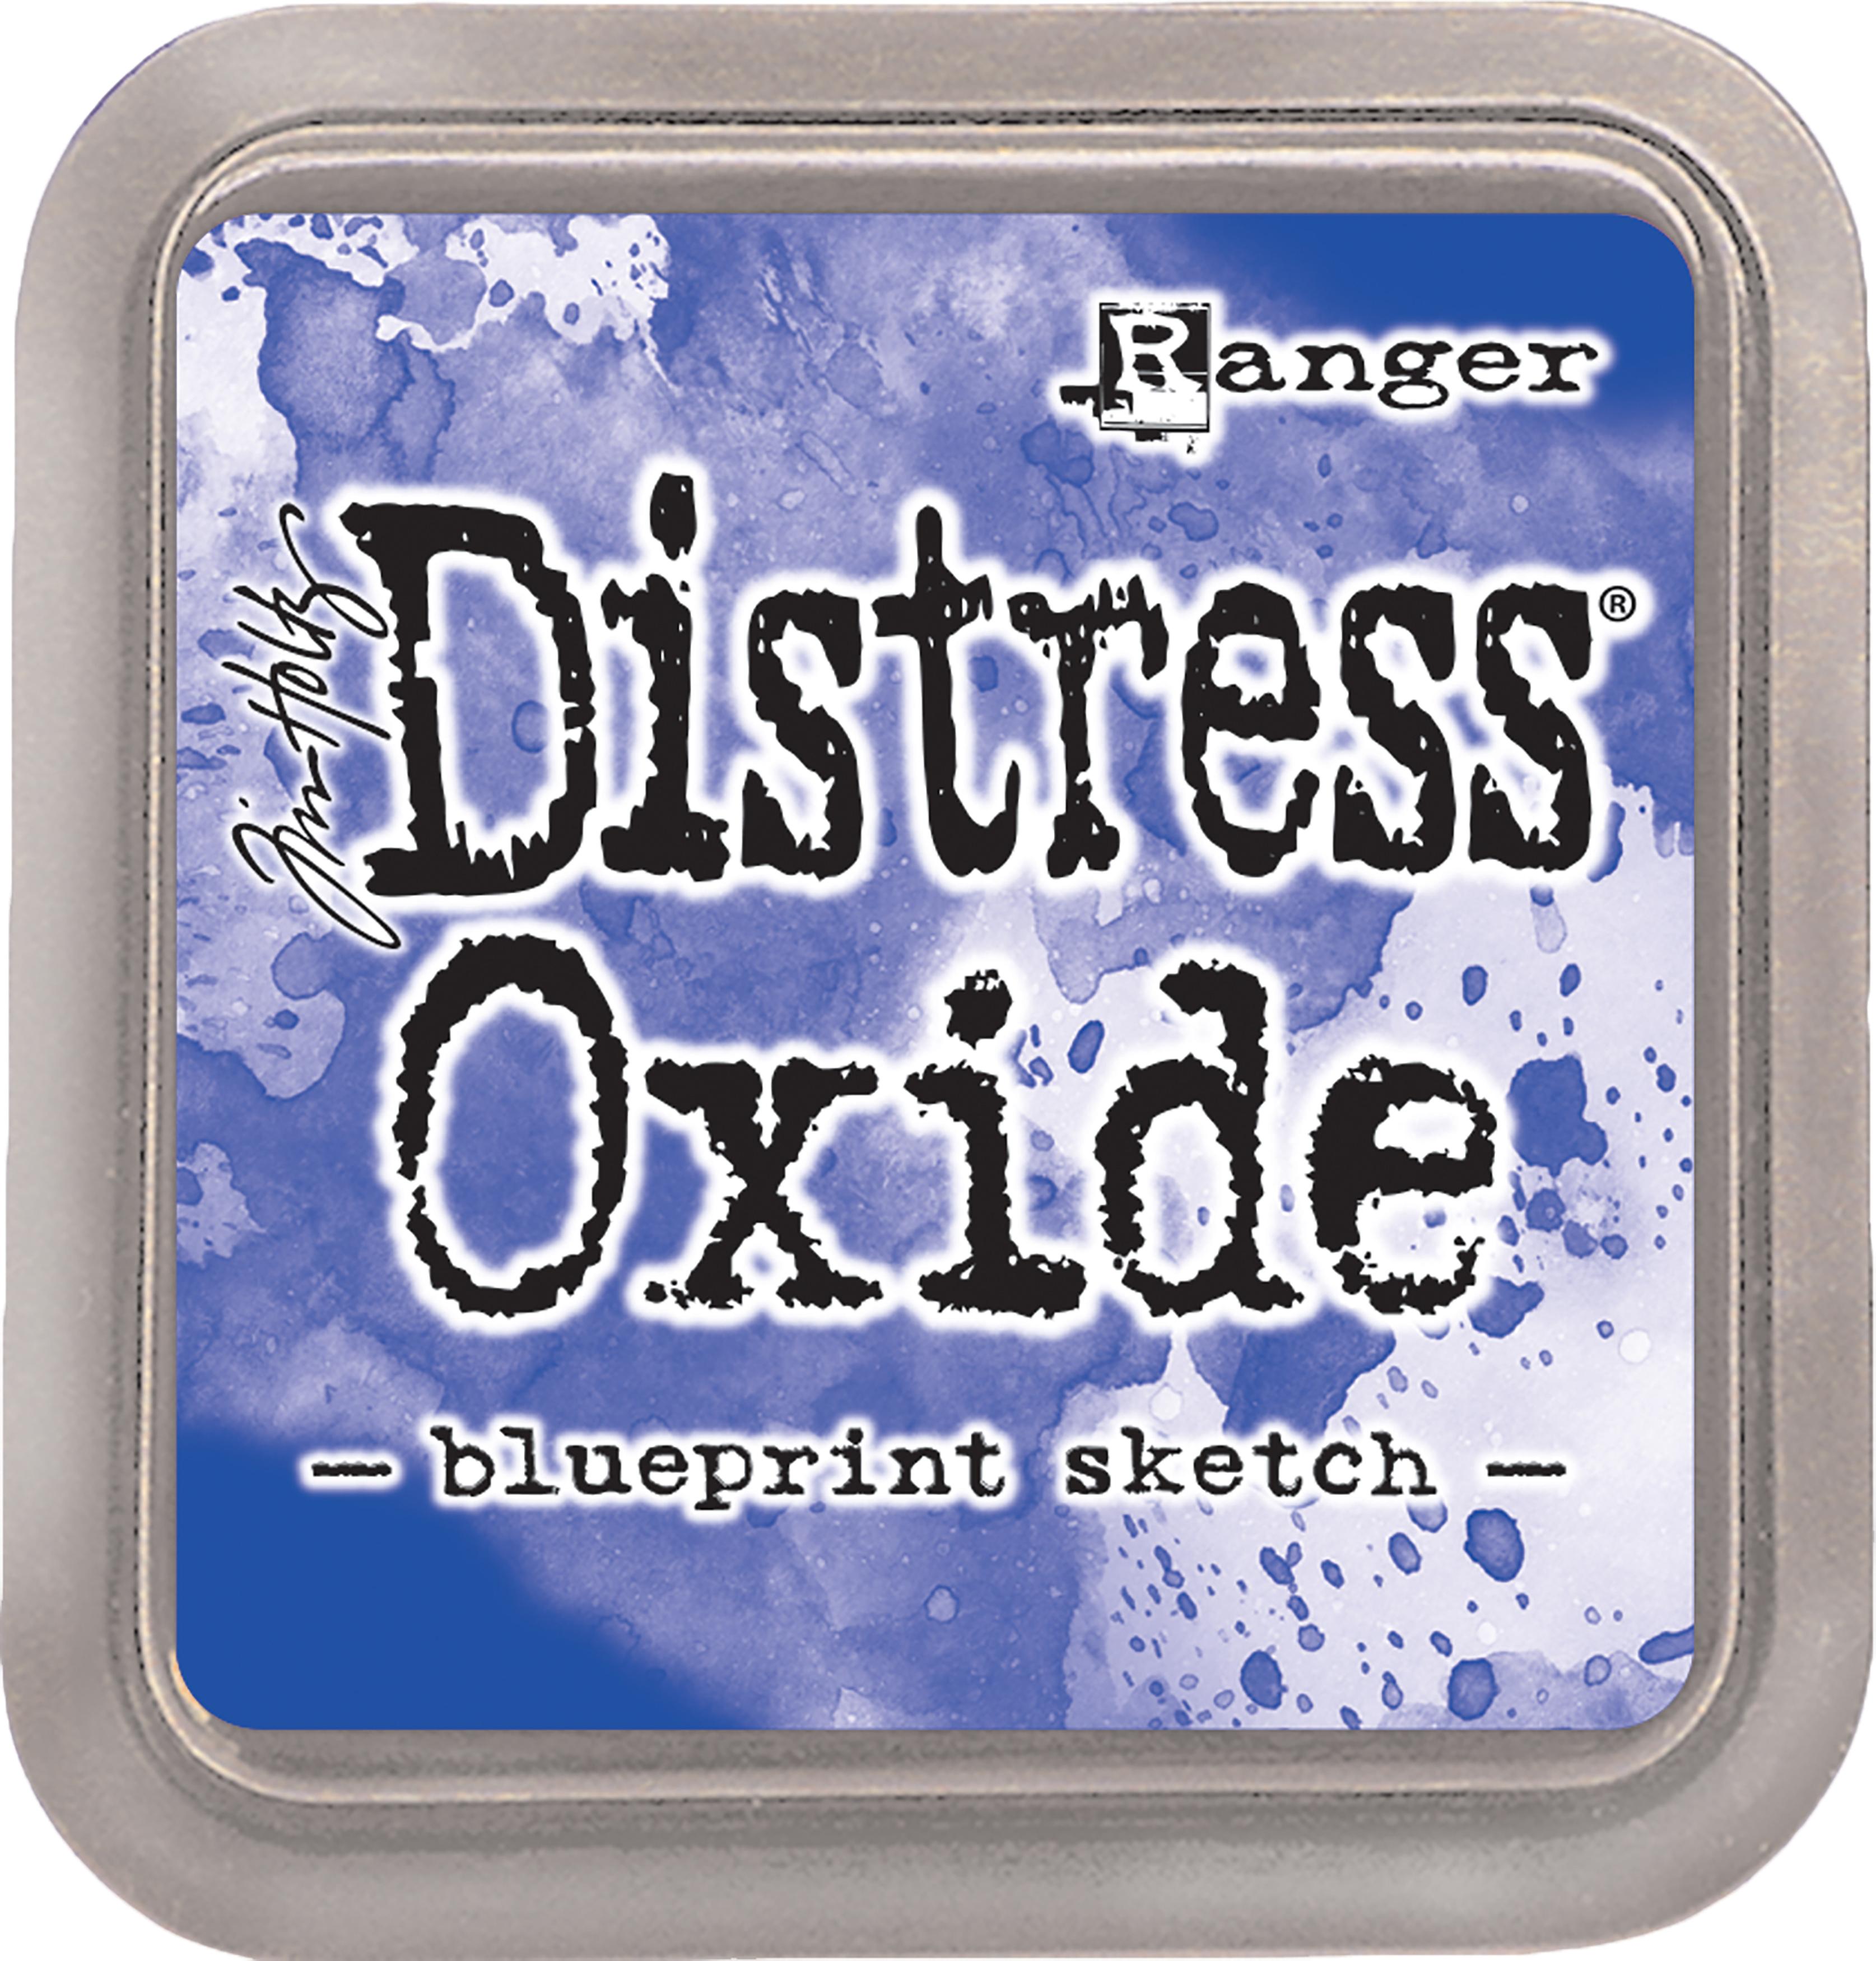 Tim Holtz Distress Oxides Ink Pad-Blueprint Sketch